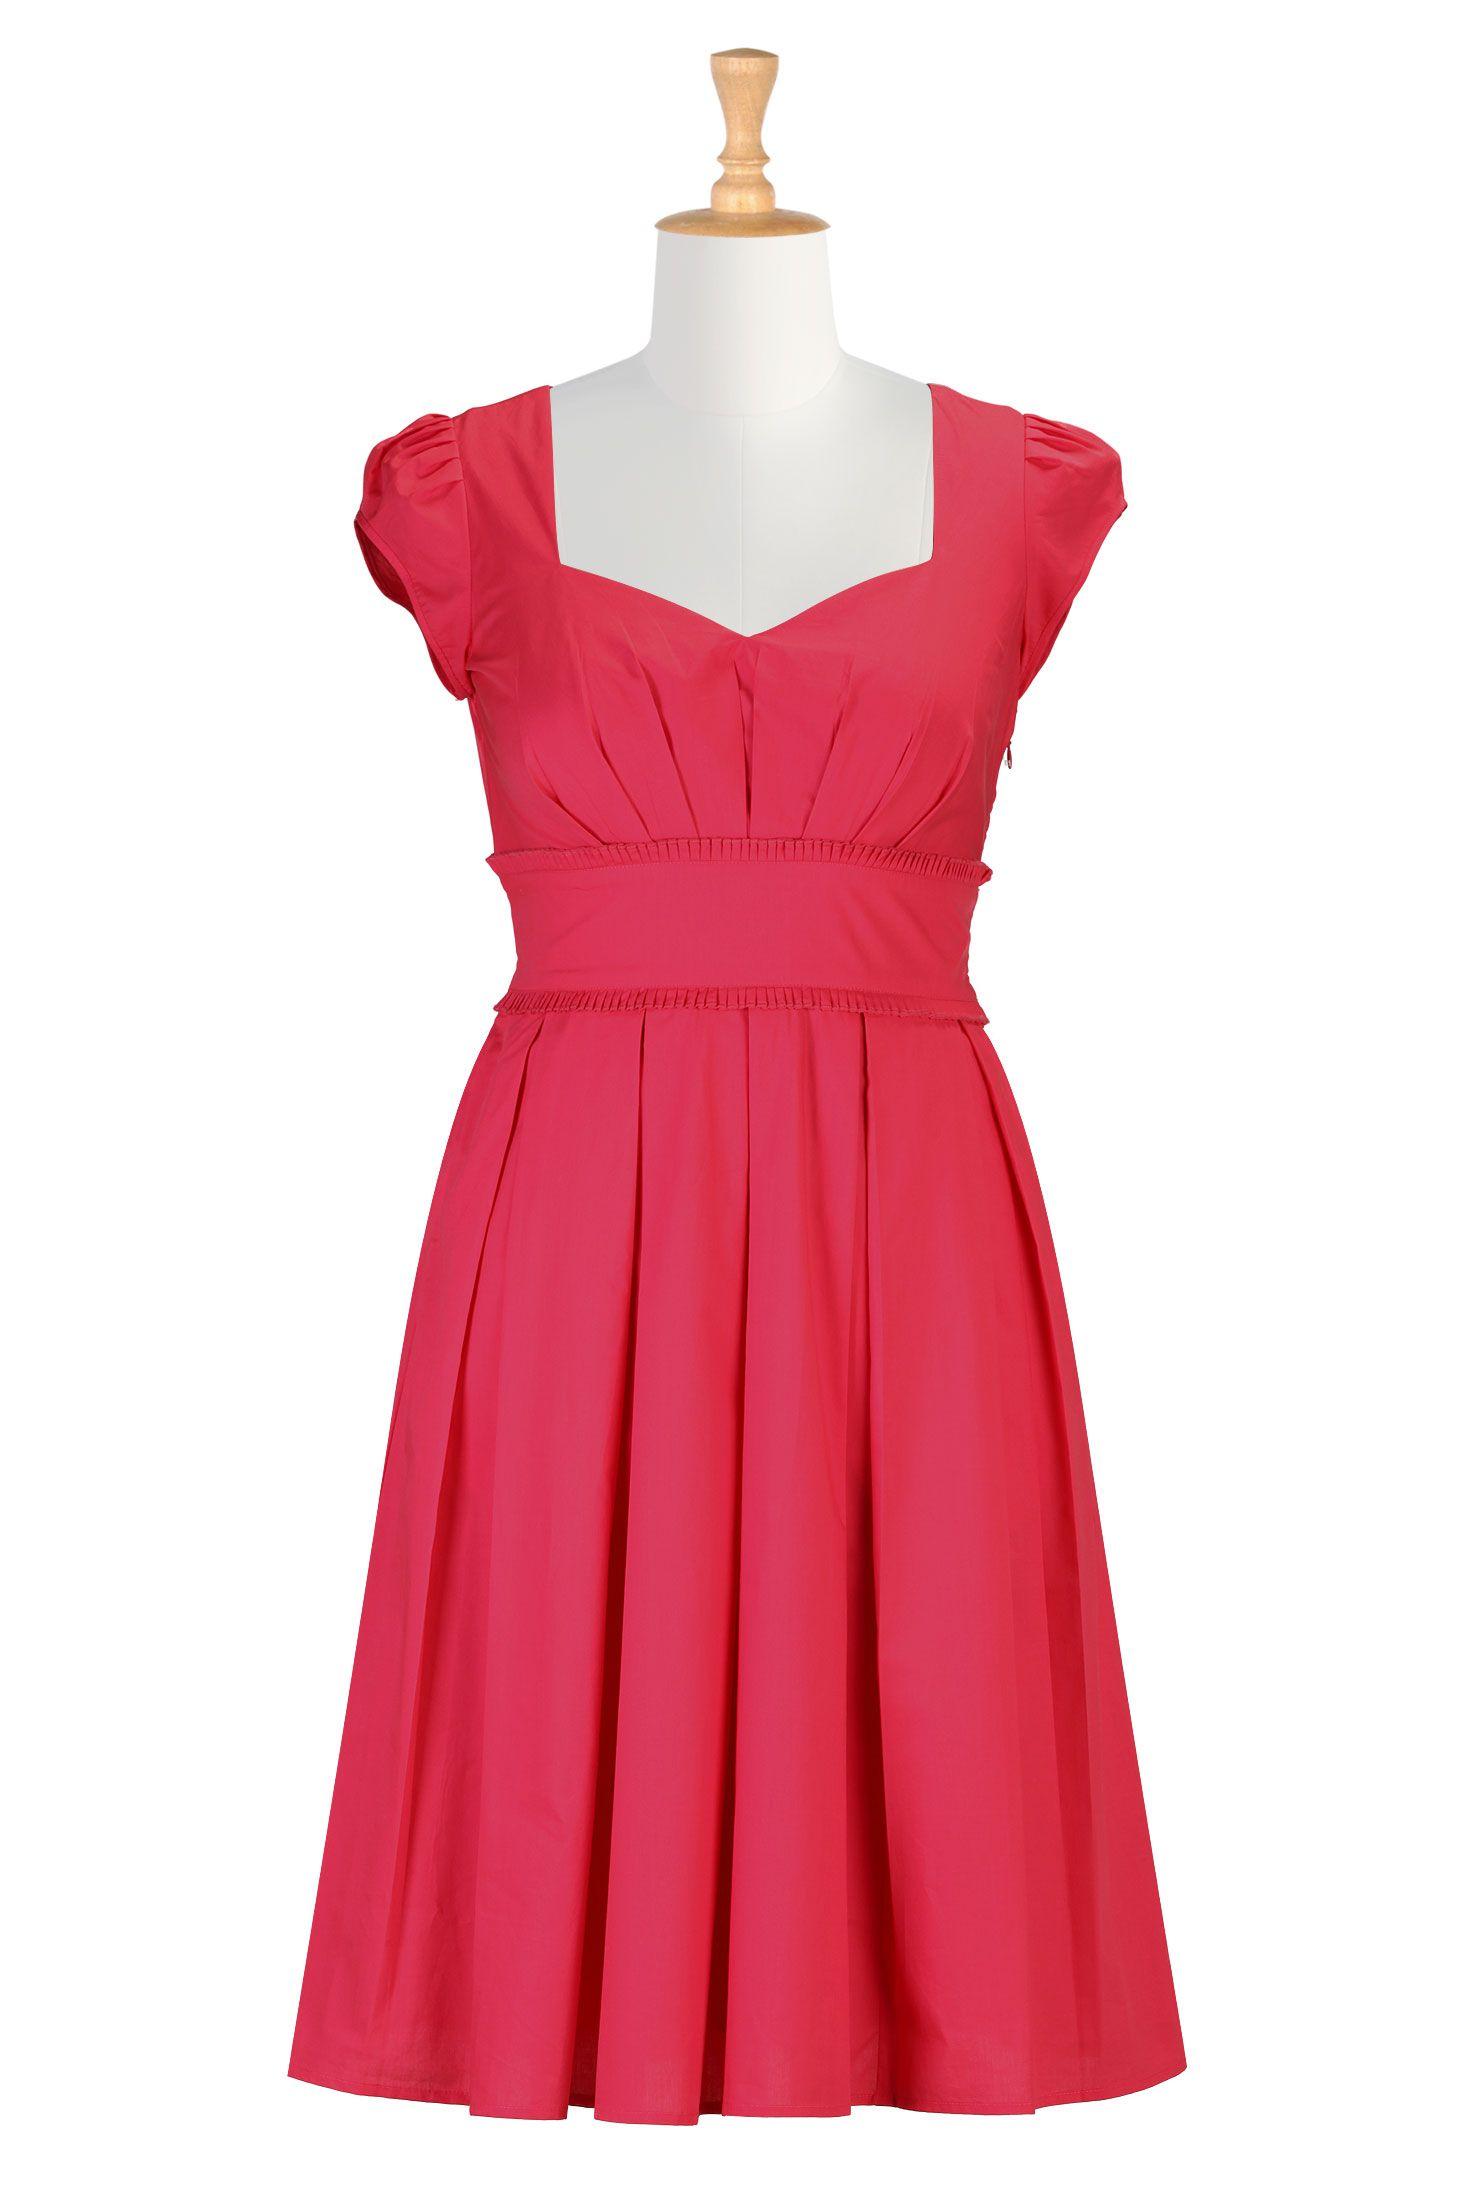 Pink Dresses for Women | Dress images